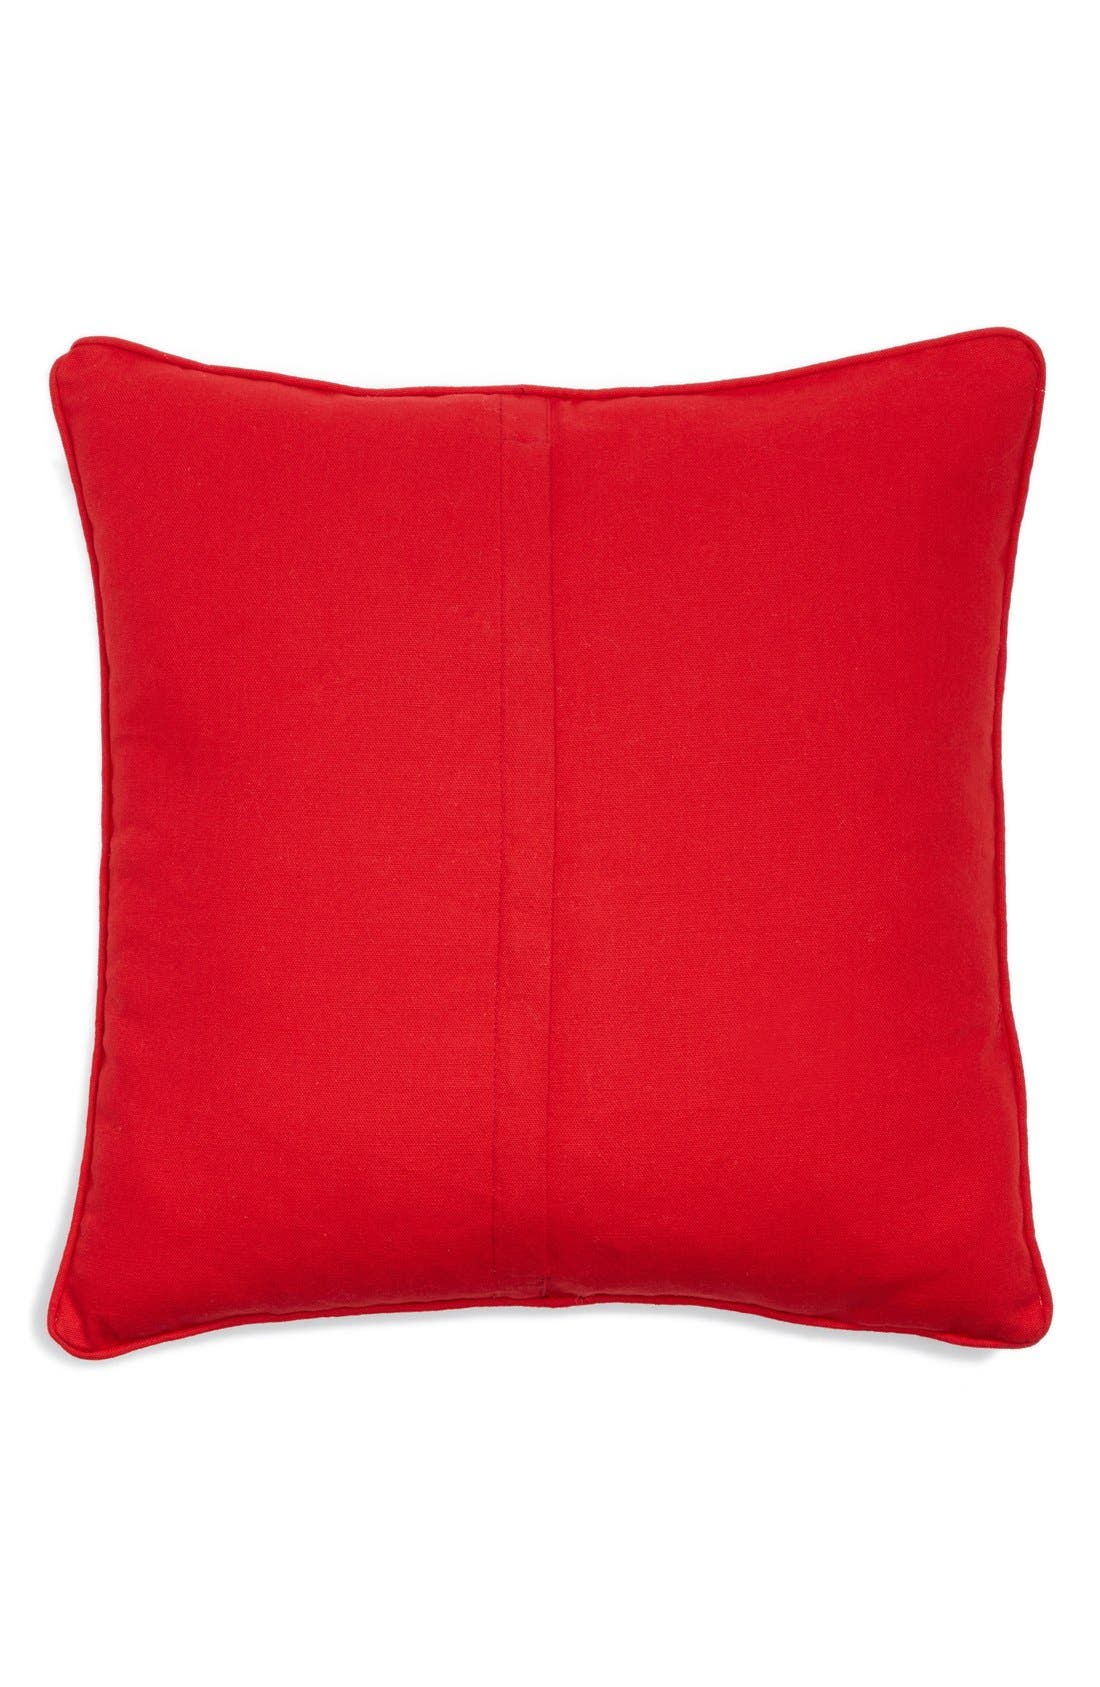 Alternate Image 2  - Levtex 'Tic Tac Toe' Accent Pillow